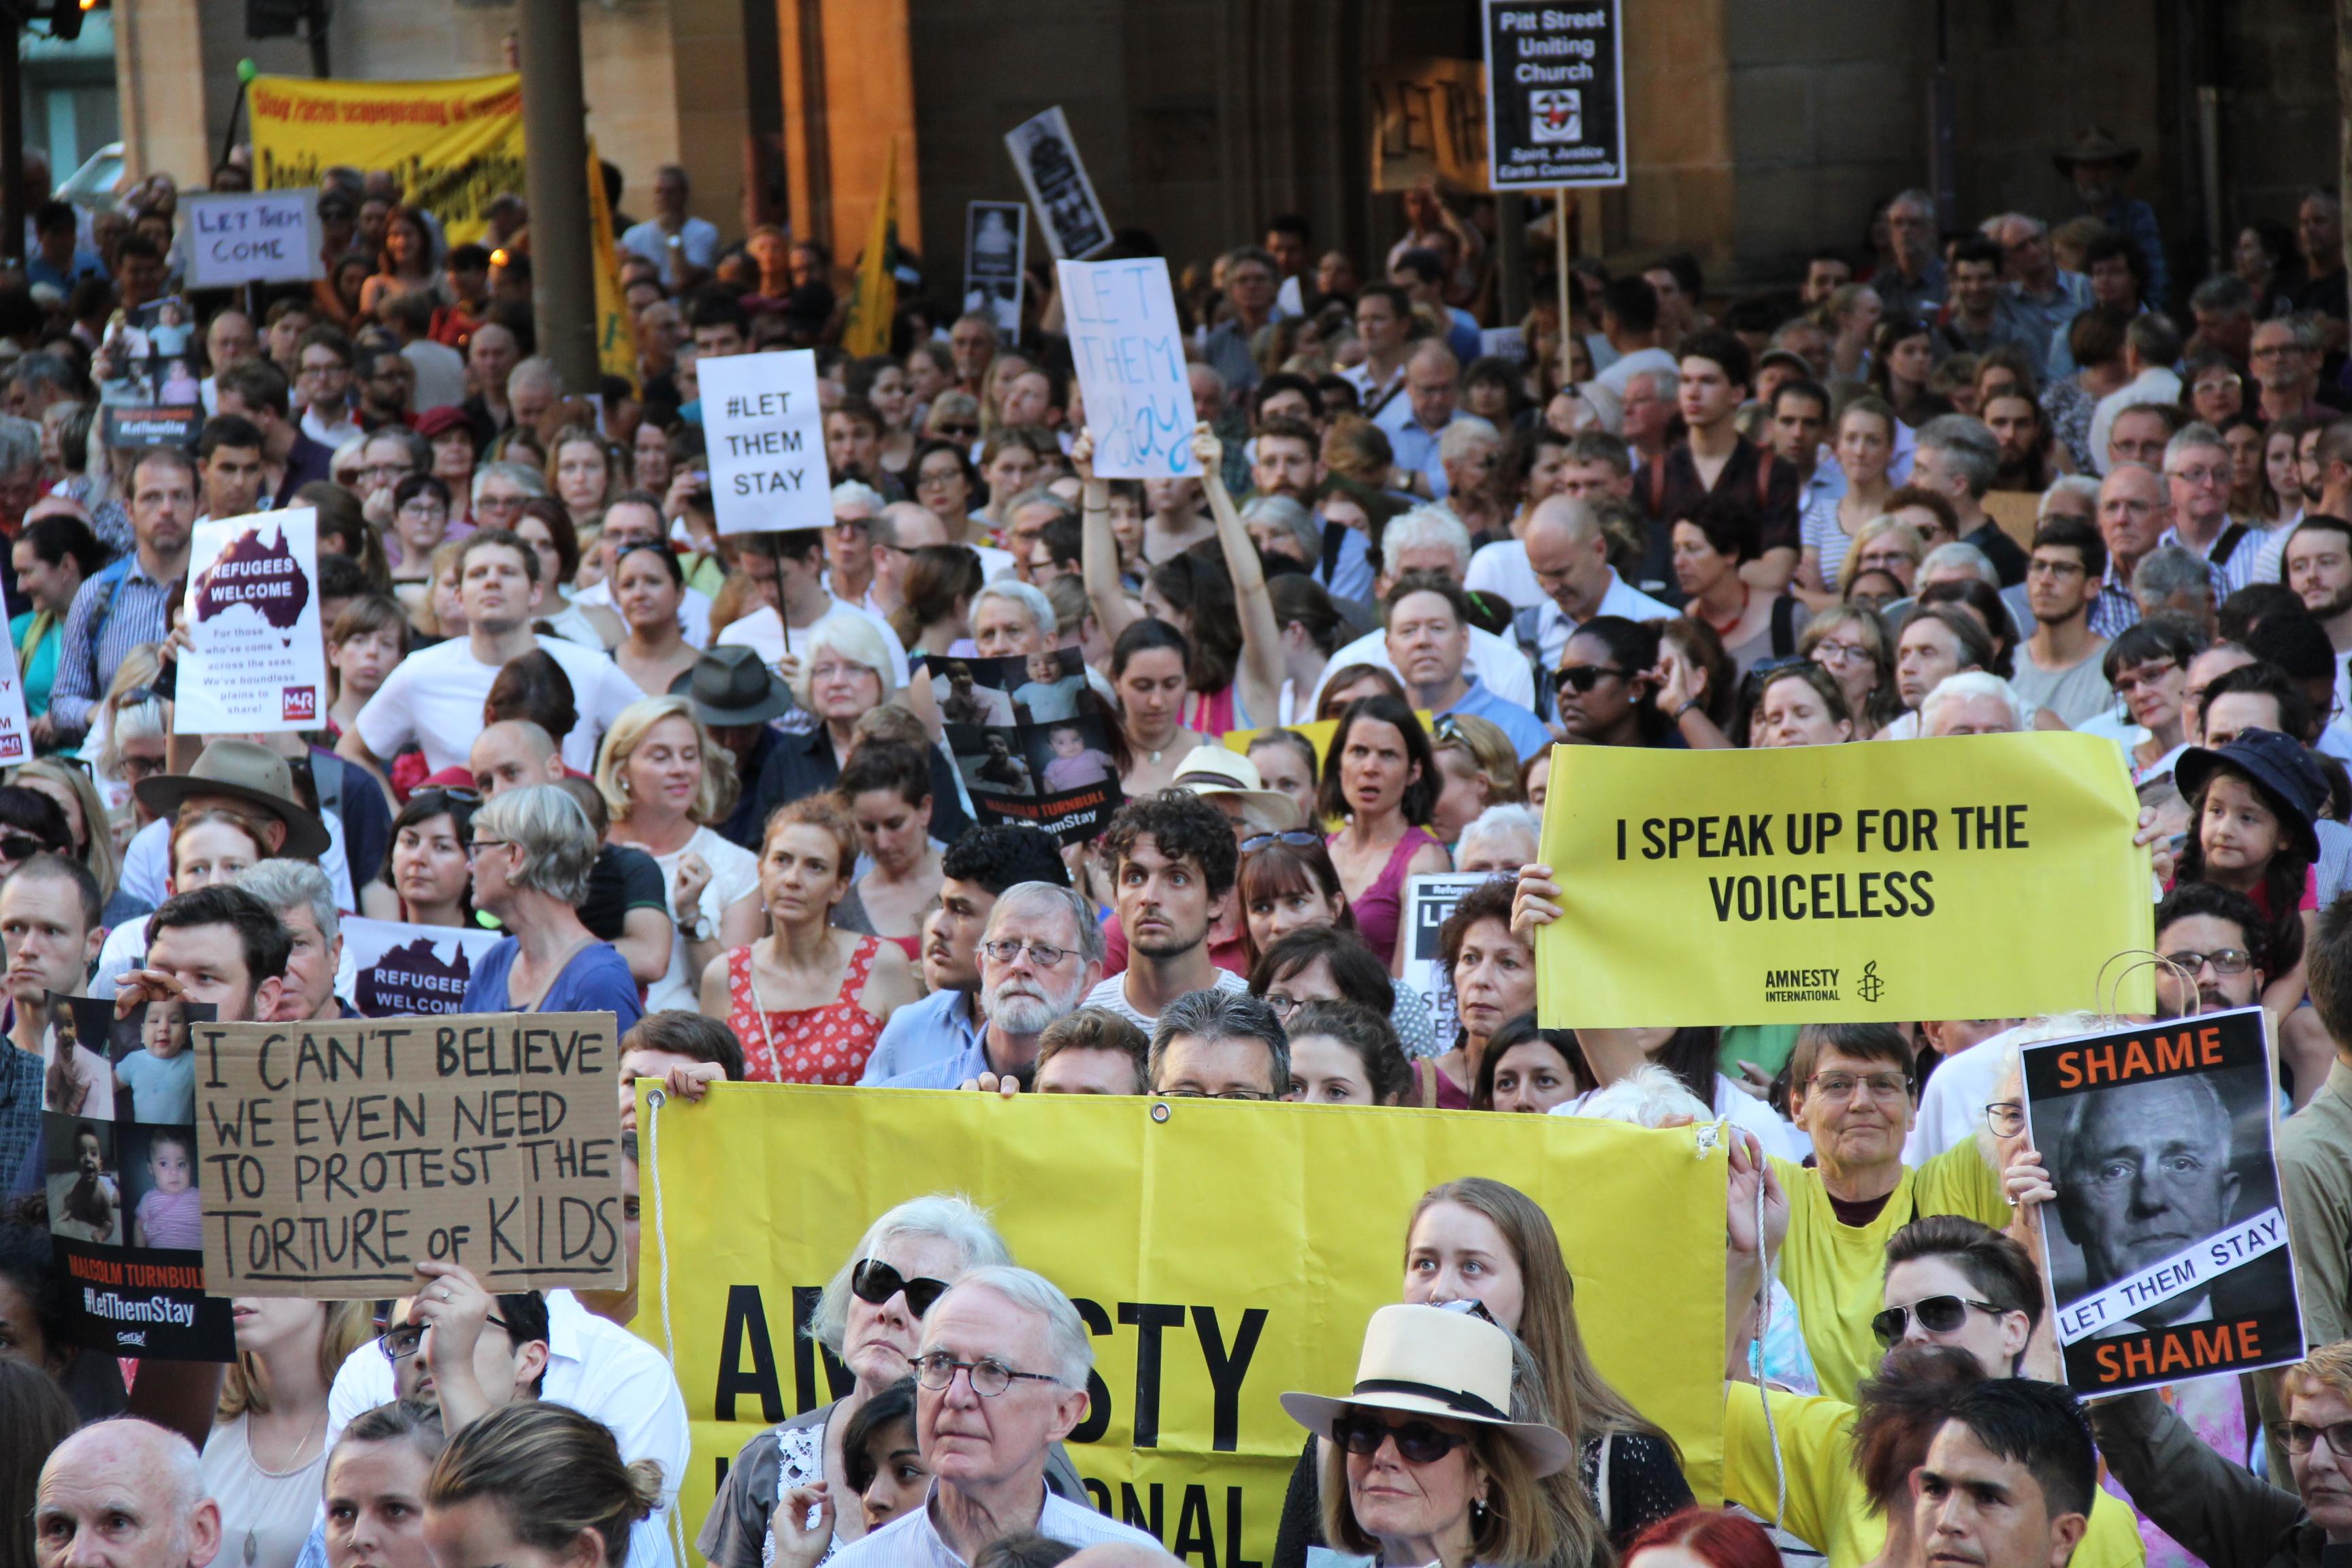 #LetThemStay refugee rally in Sydney in 2016